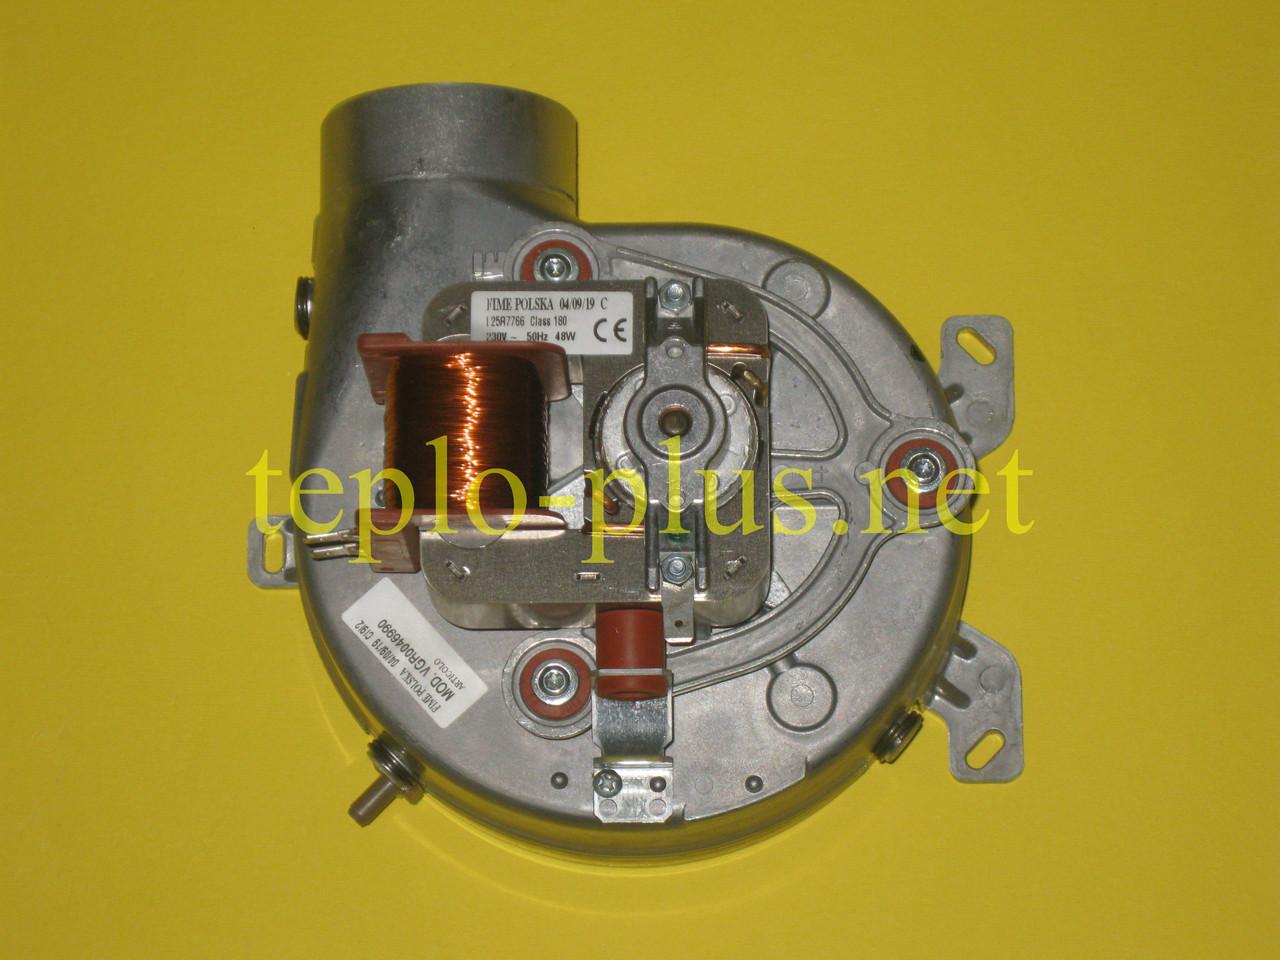 Вентилятор D003201710 (3003201710) Demrad Demrad Nitron HKF 224, HKF 230